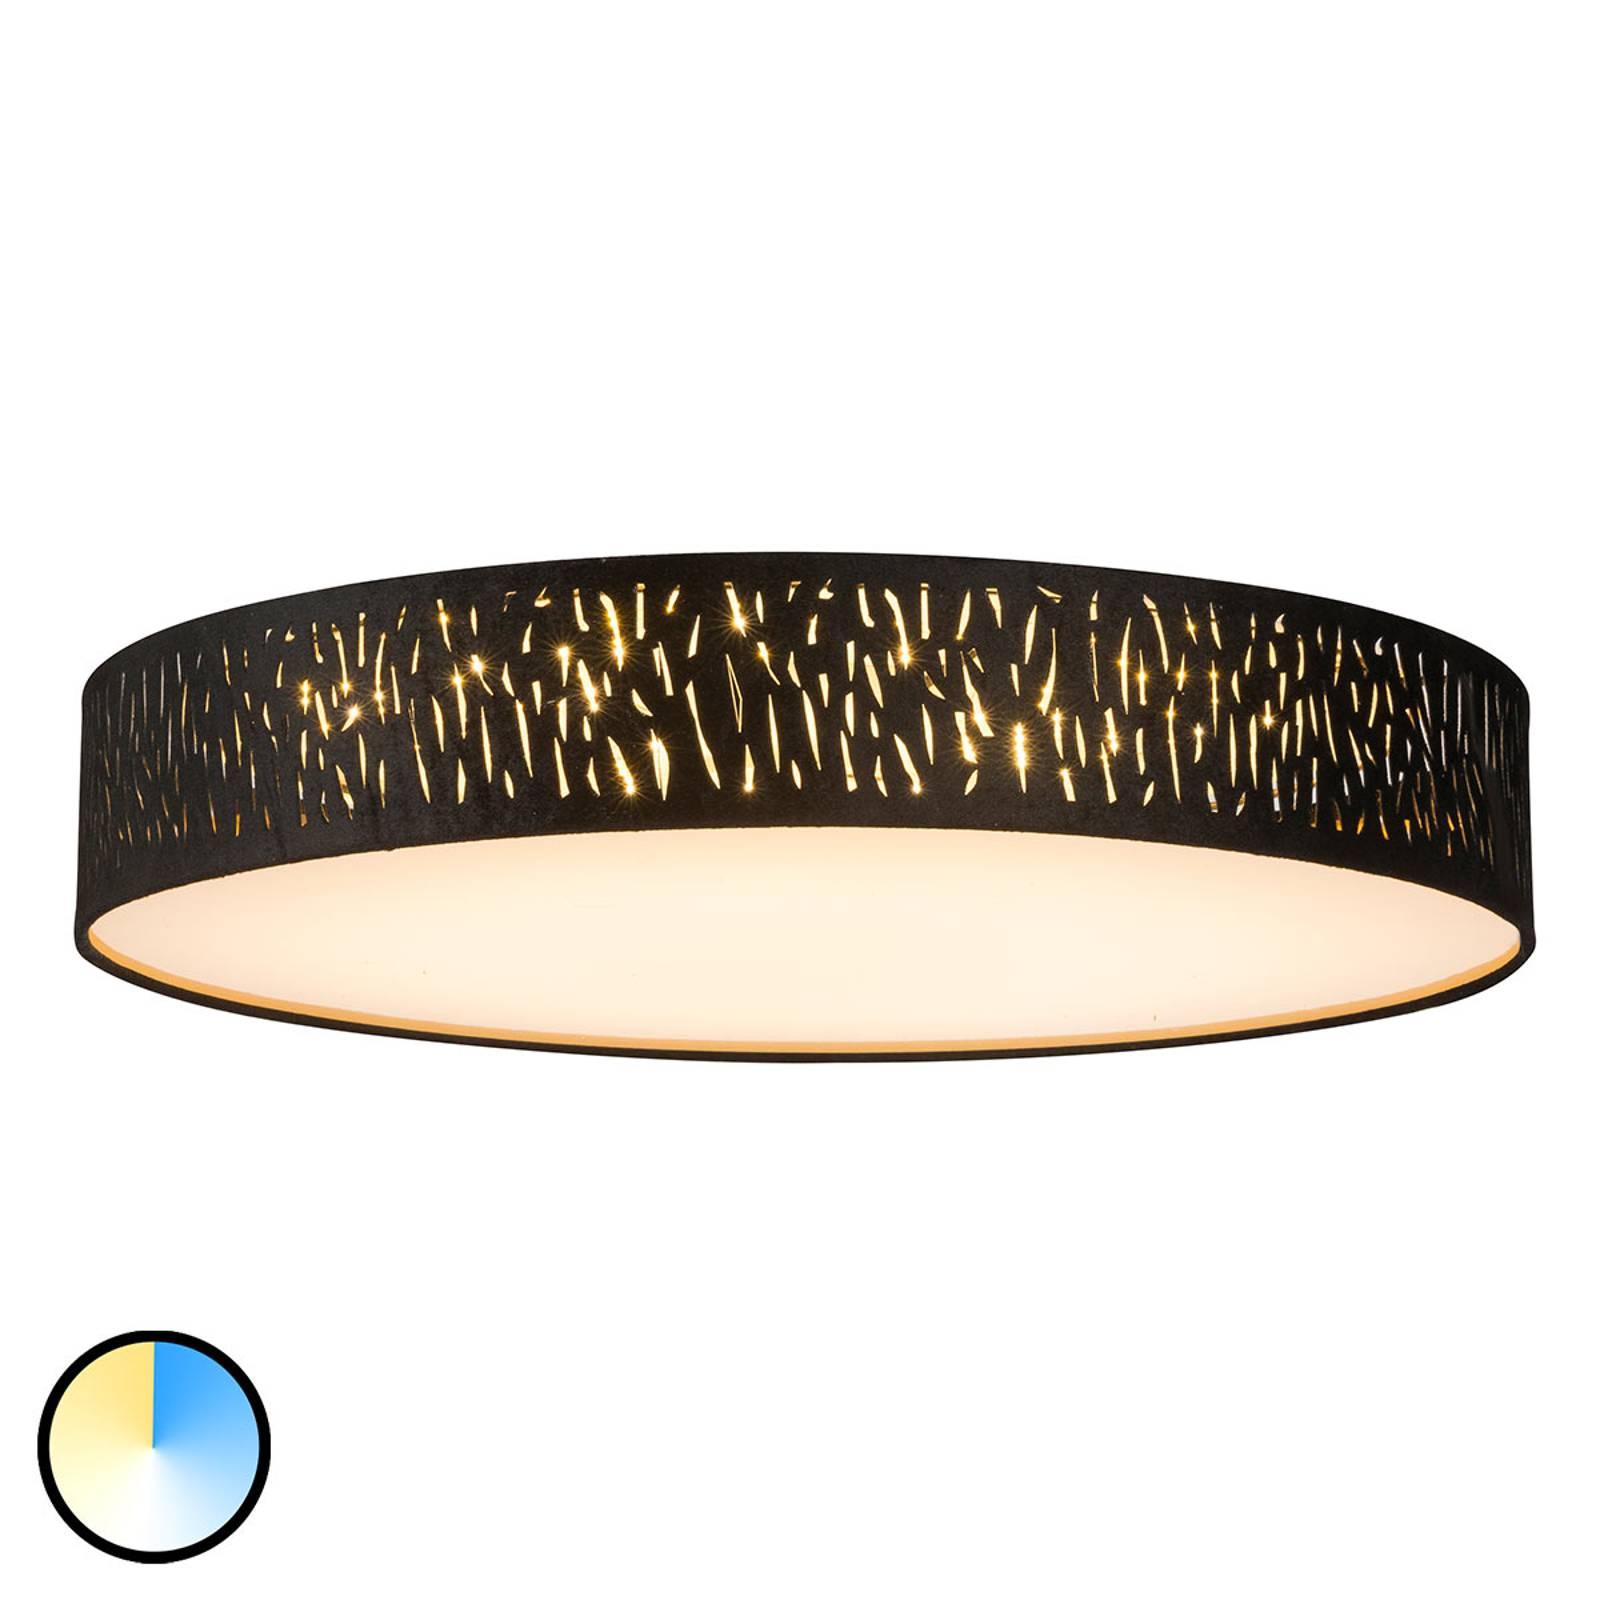 LED plafondlamp Tucson rond, met Tunable White